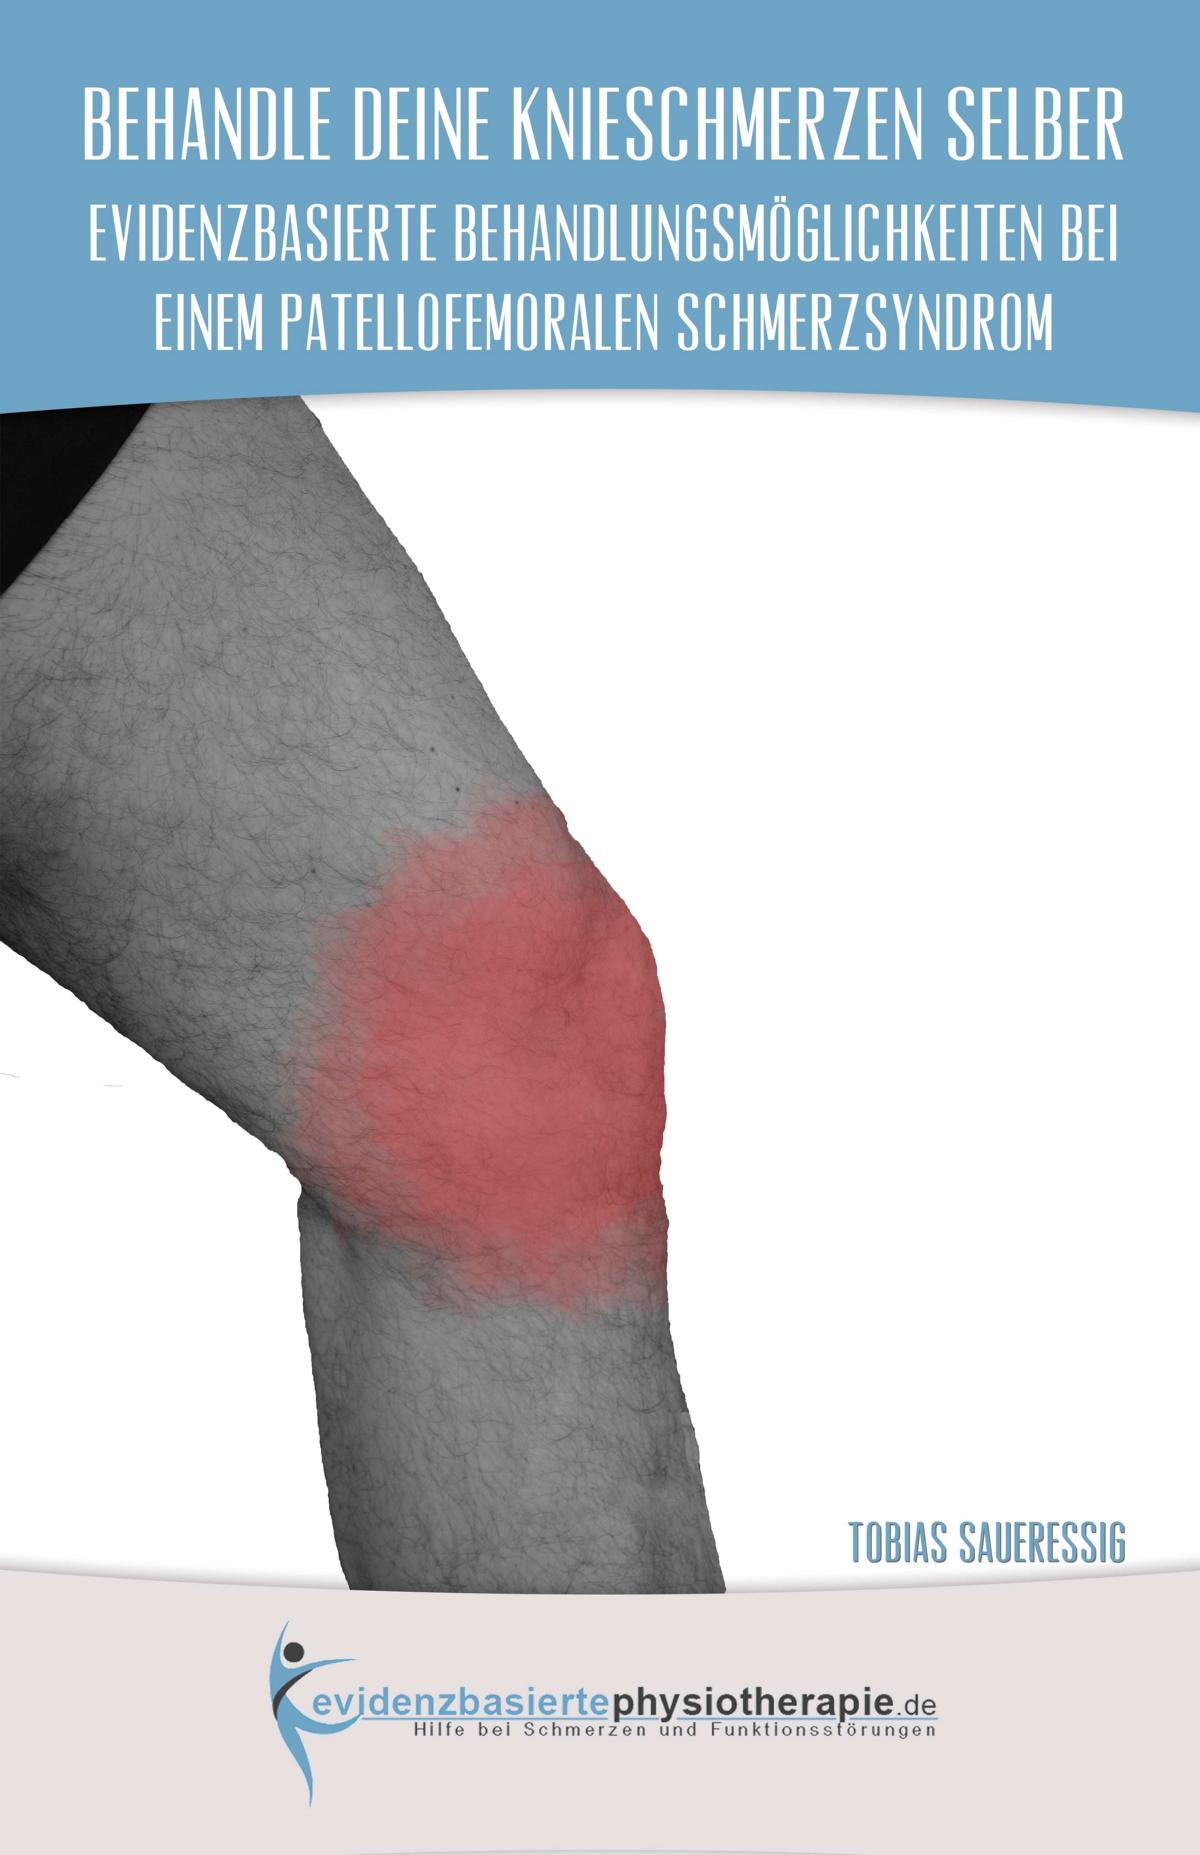 Buch Patellofemorales Schmerzsyndrom, Chondropathia patellae, (Knieschmerzen)